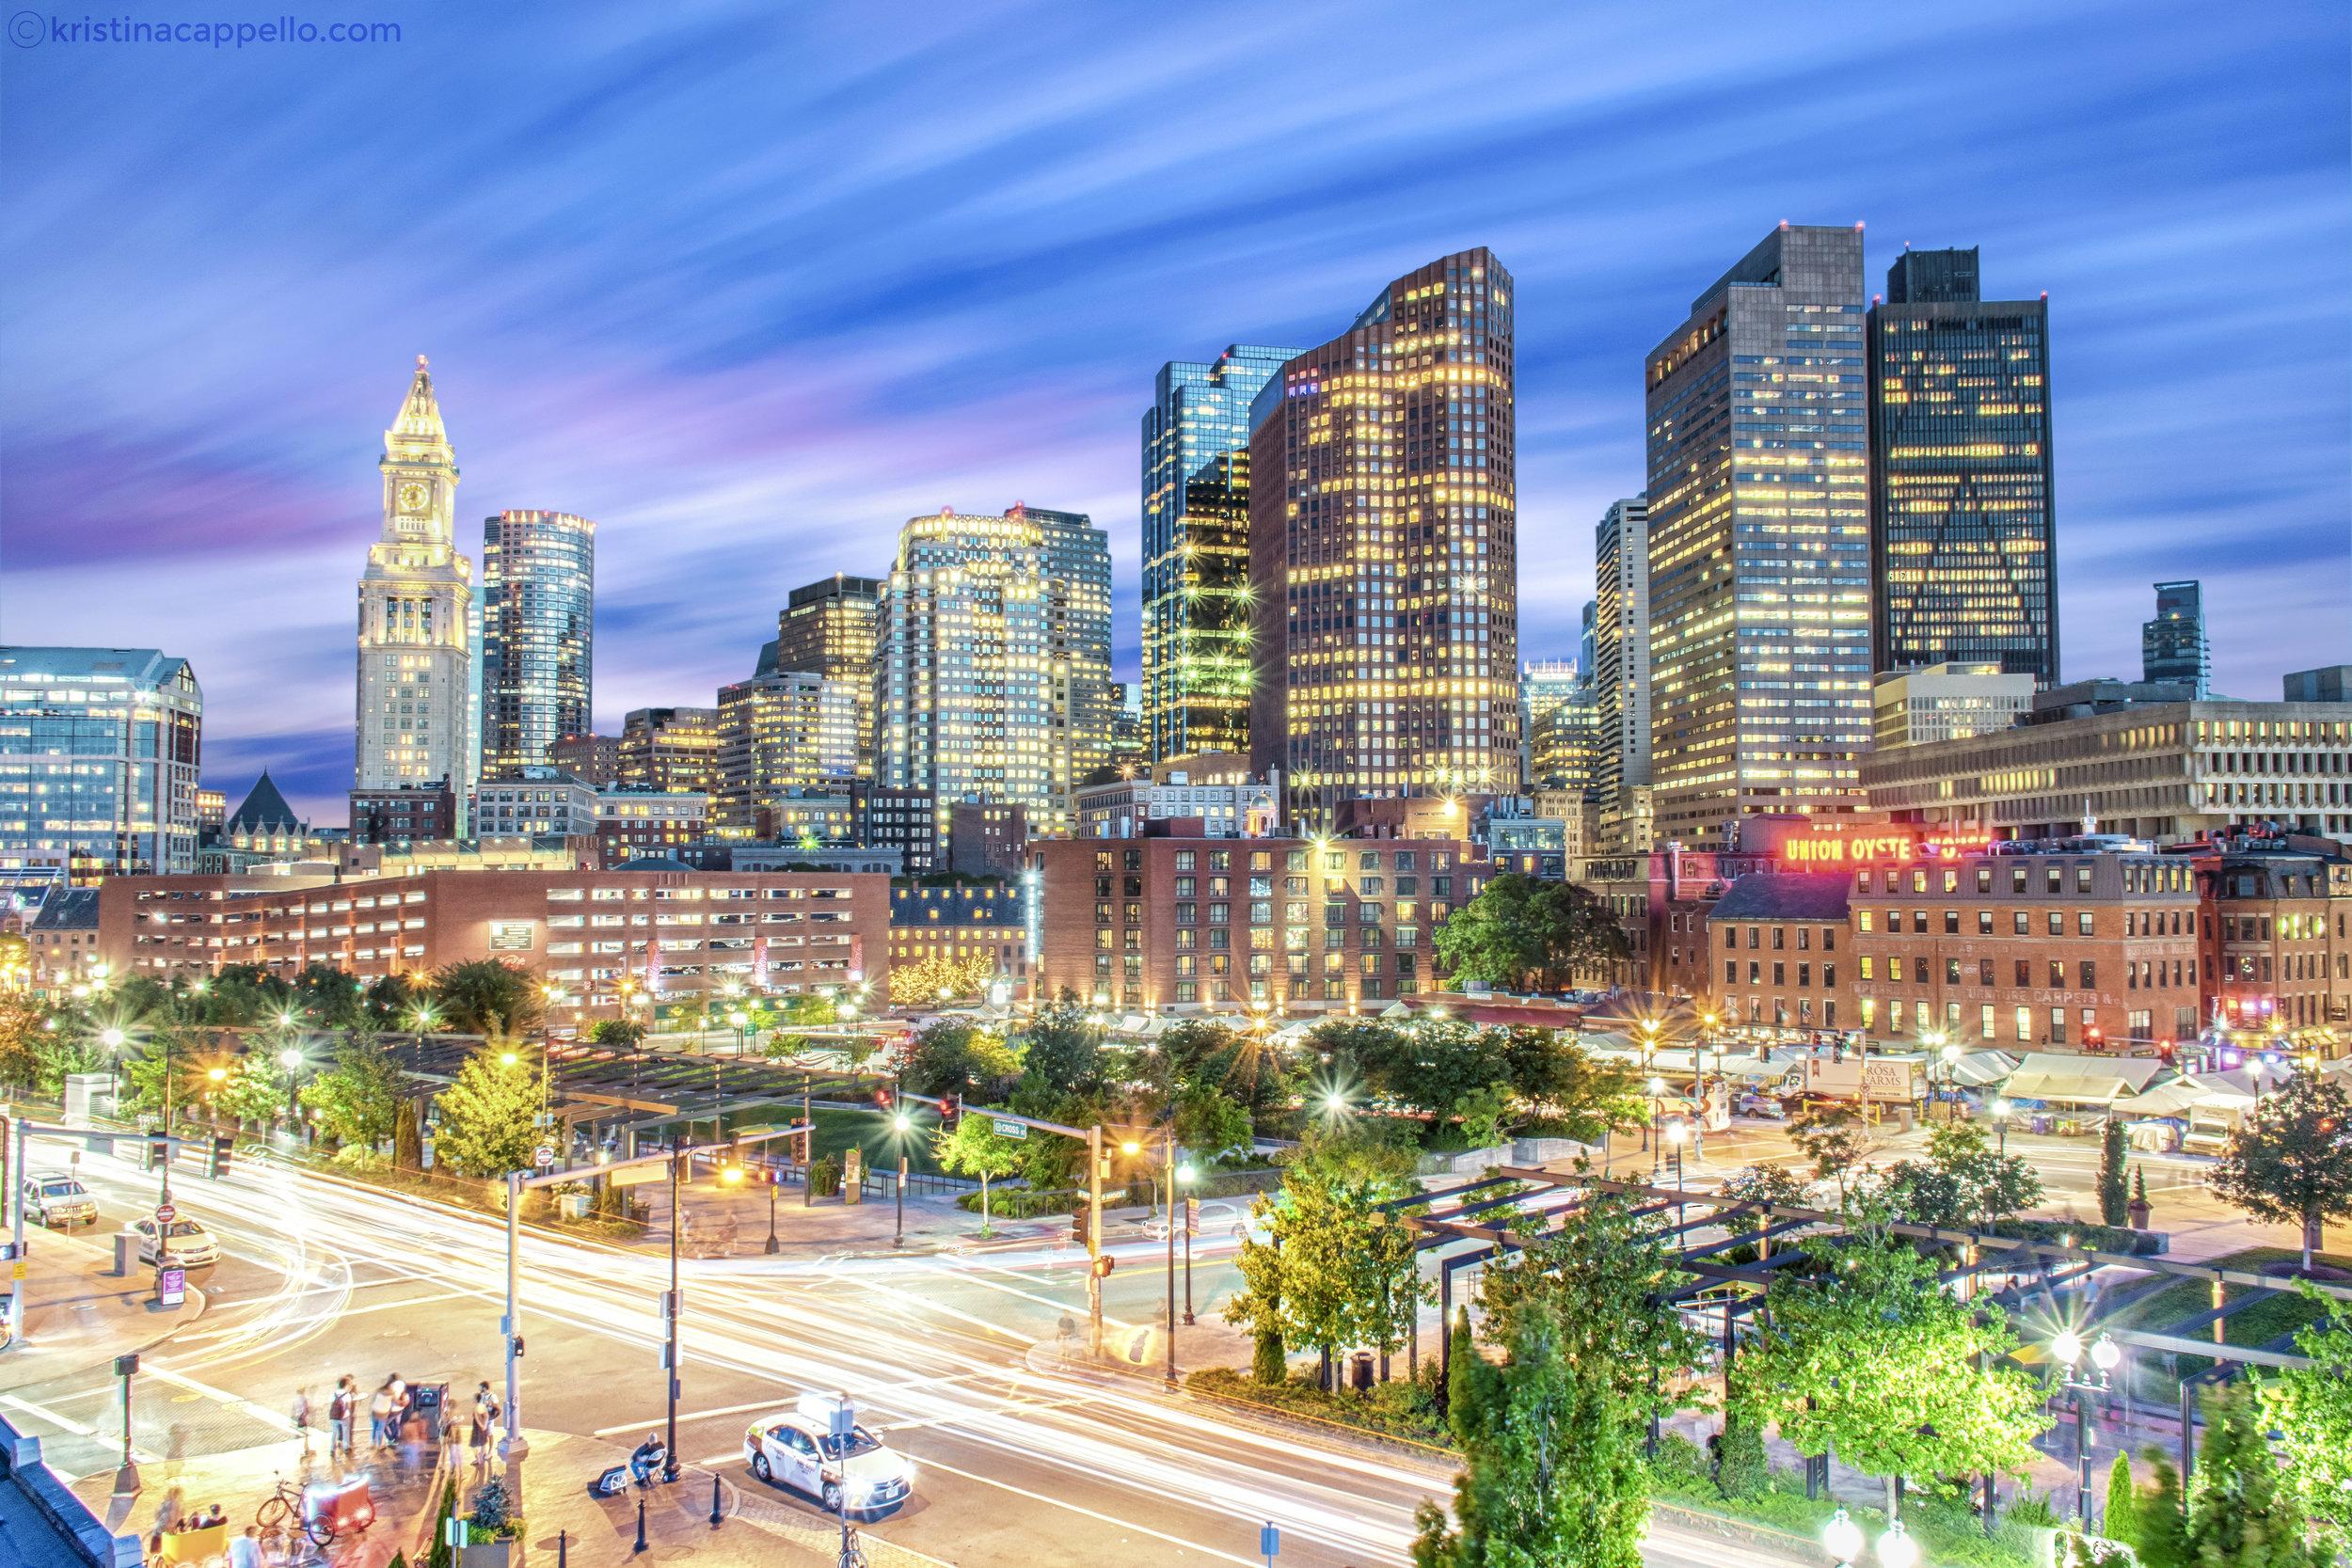 Downtown Boston, Massachusetts